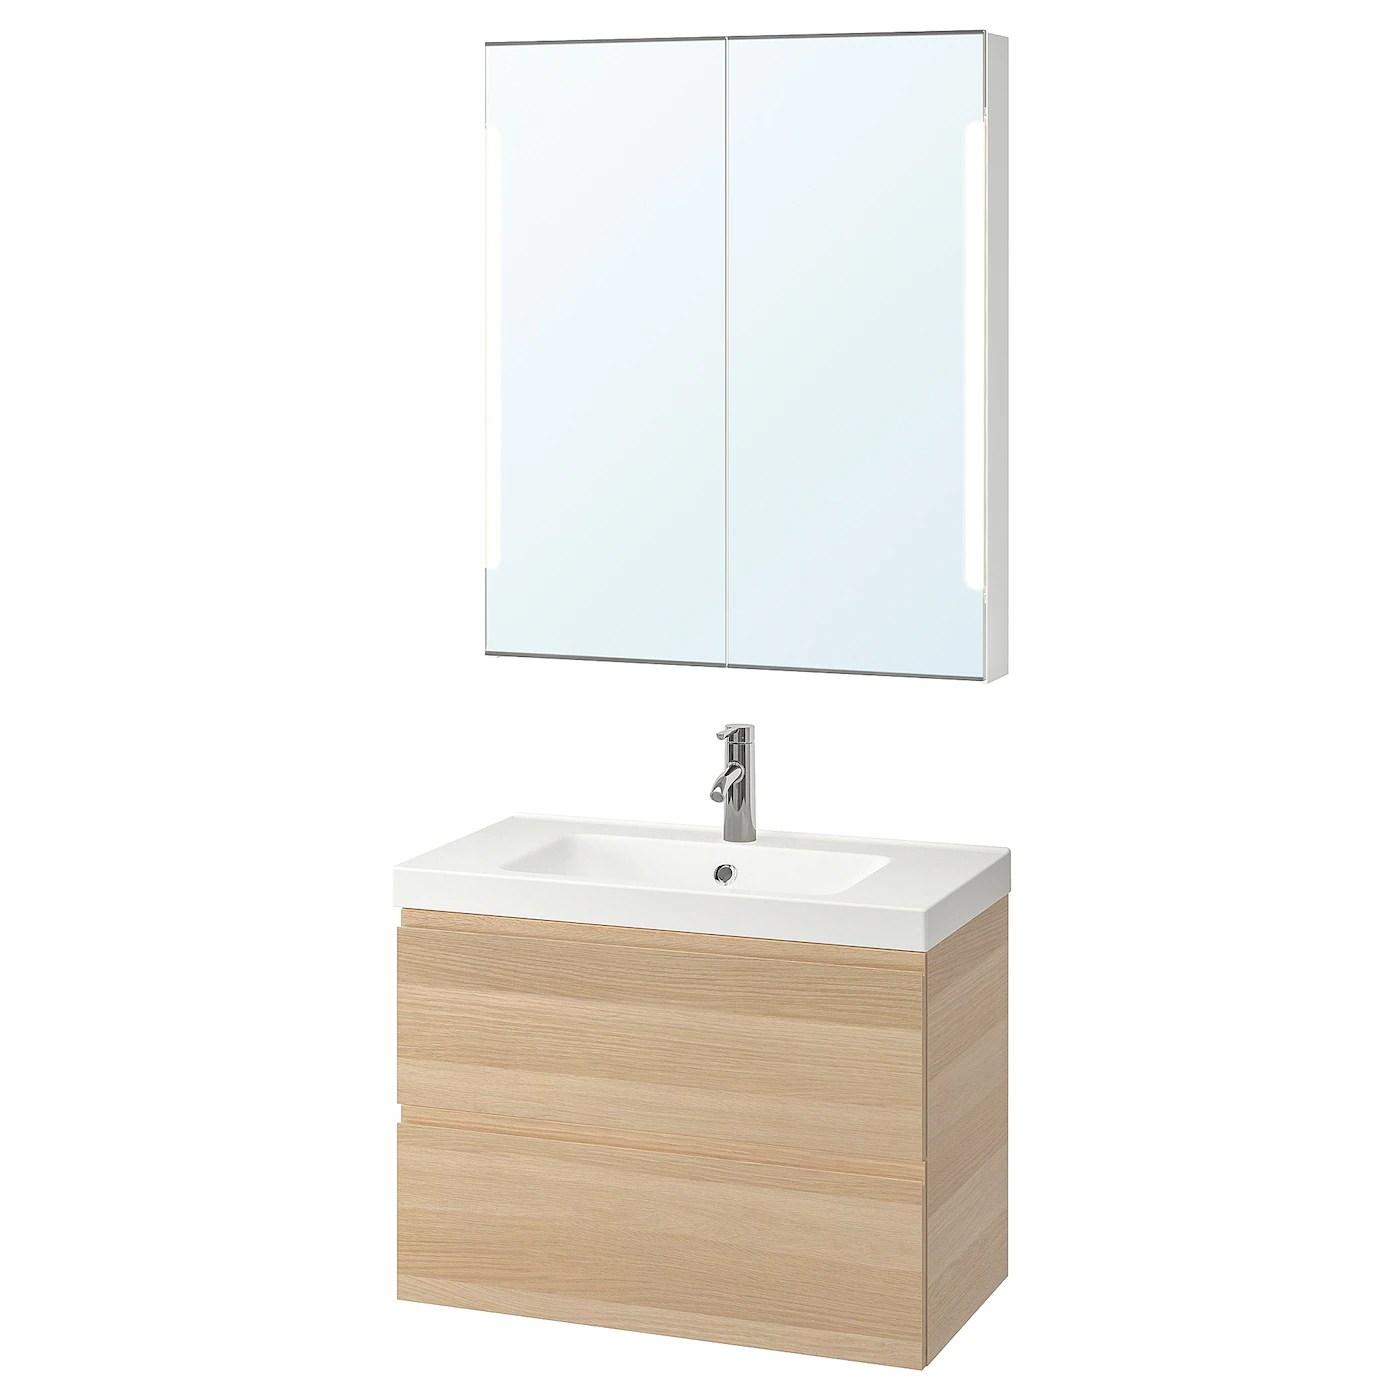 Godmorgon Odensvik Mobilier Salle De Bain 4 Pieces Effet Chene Blanc Hi Dalskar Mitigeur Lavabo83 Cm Ikea